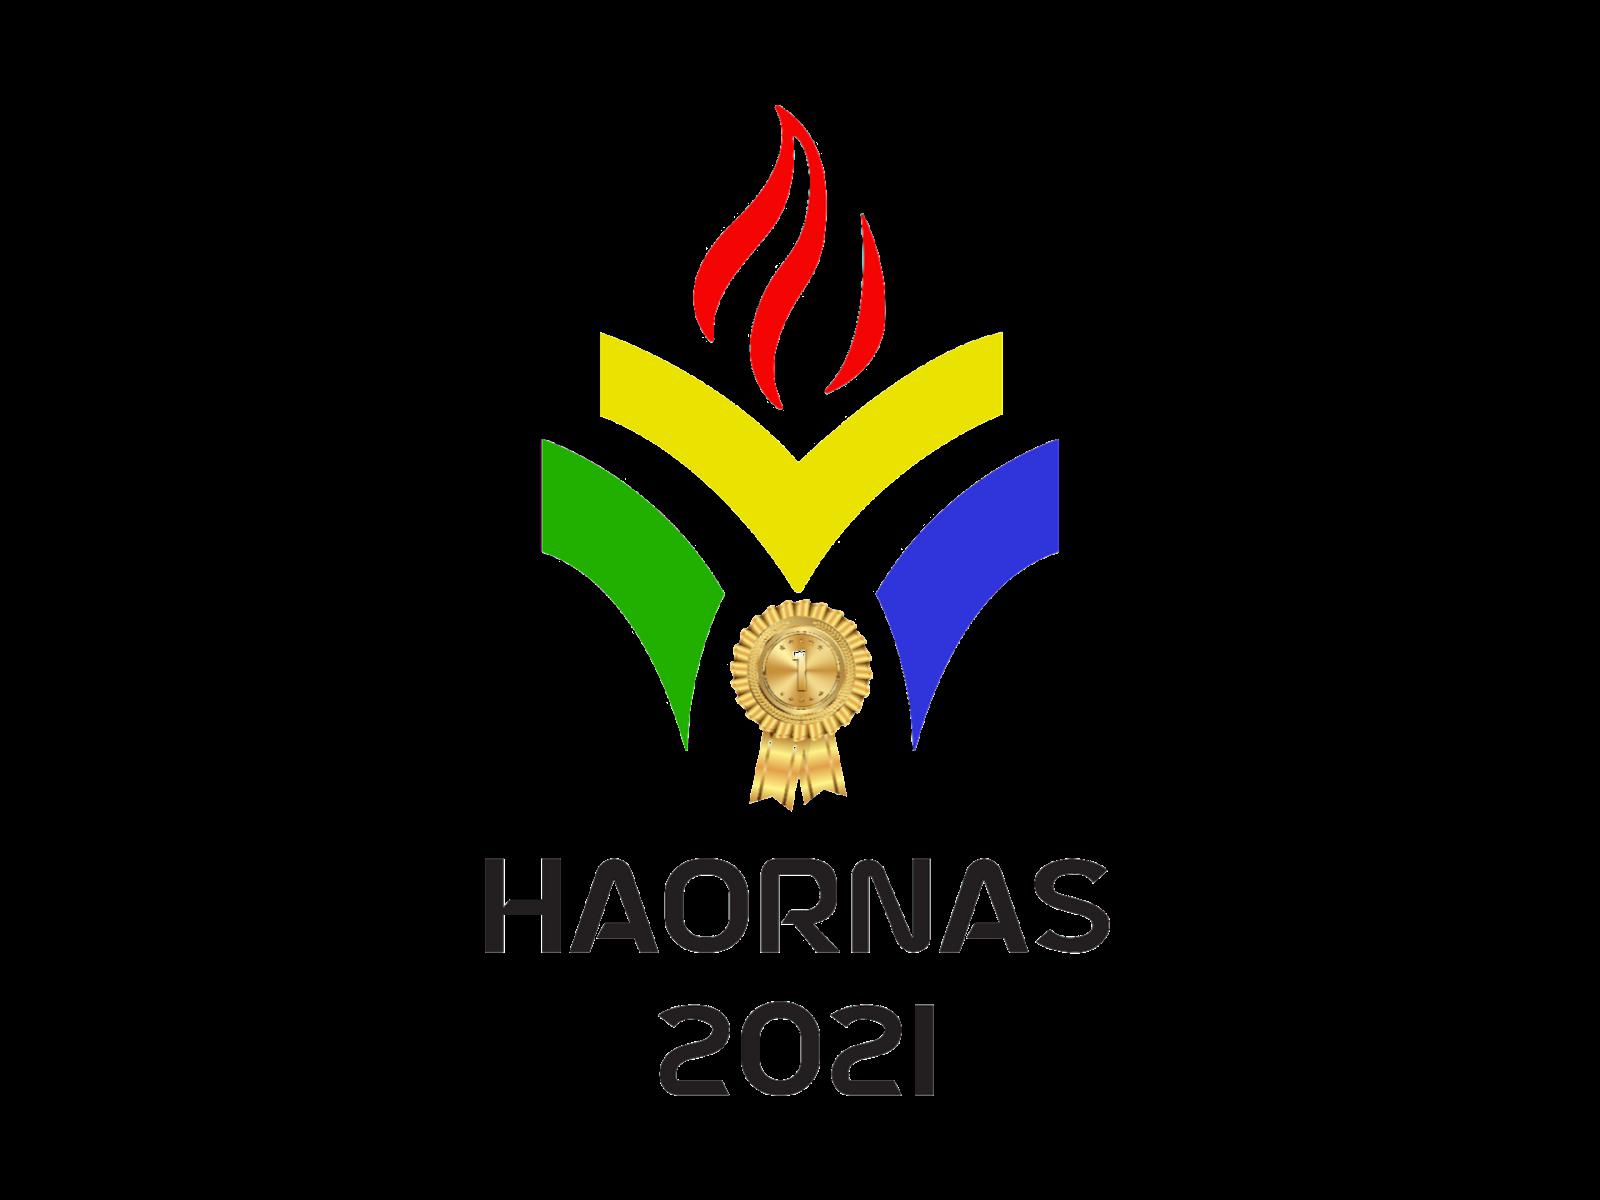 Logo HAORNAS 2021 Format PNG